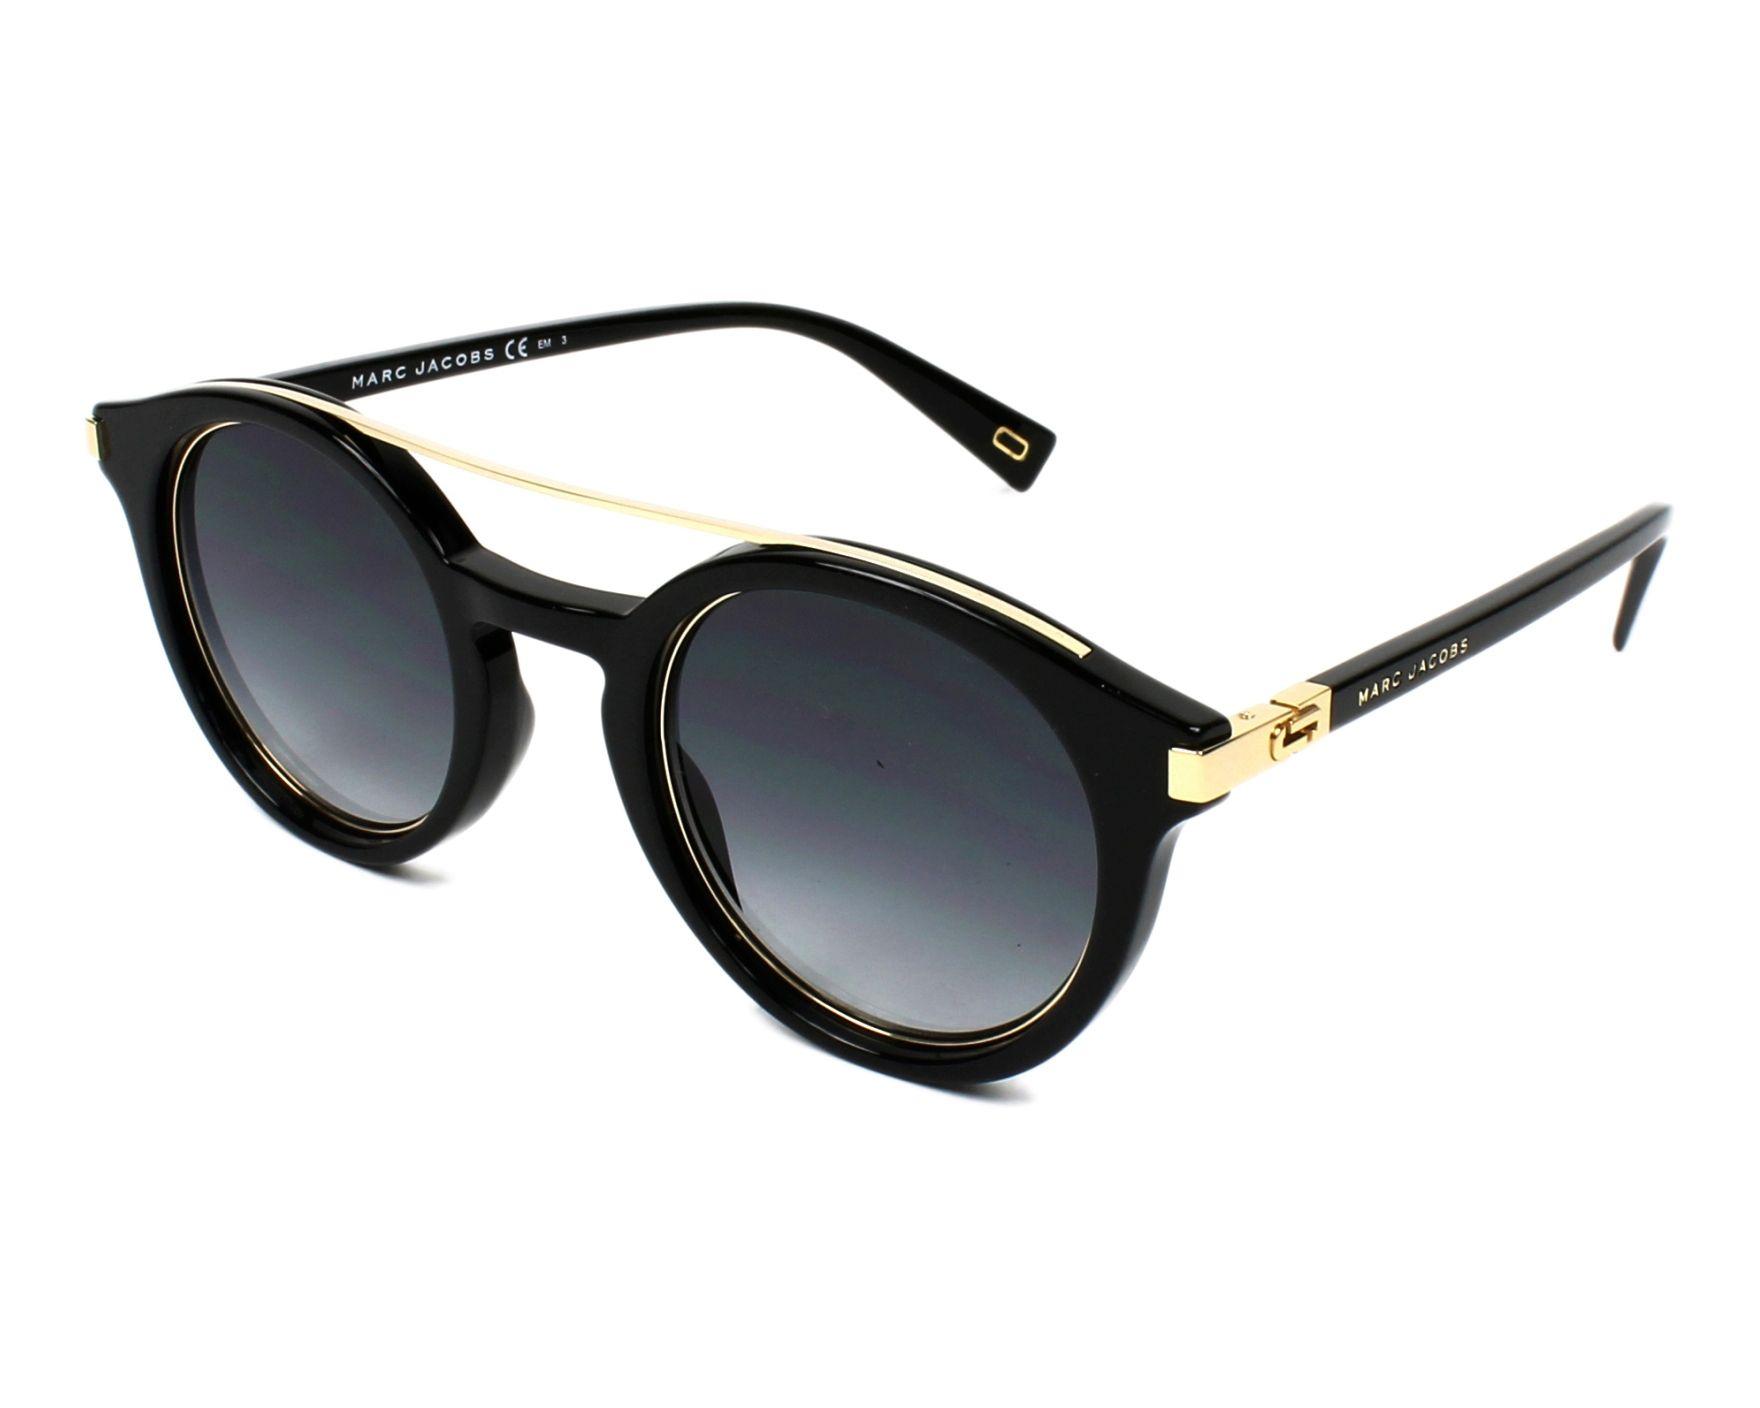 MARC JACOBS Marc Jacobs Sonnenbrille » MARC 173/S«, schwarz, 284/IR - schwarz/grau